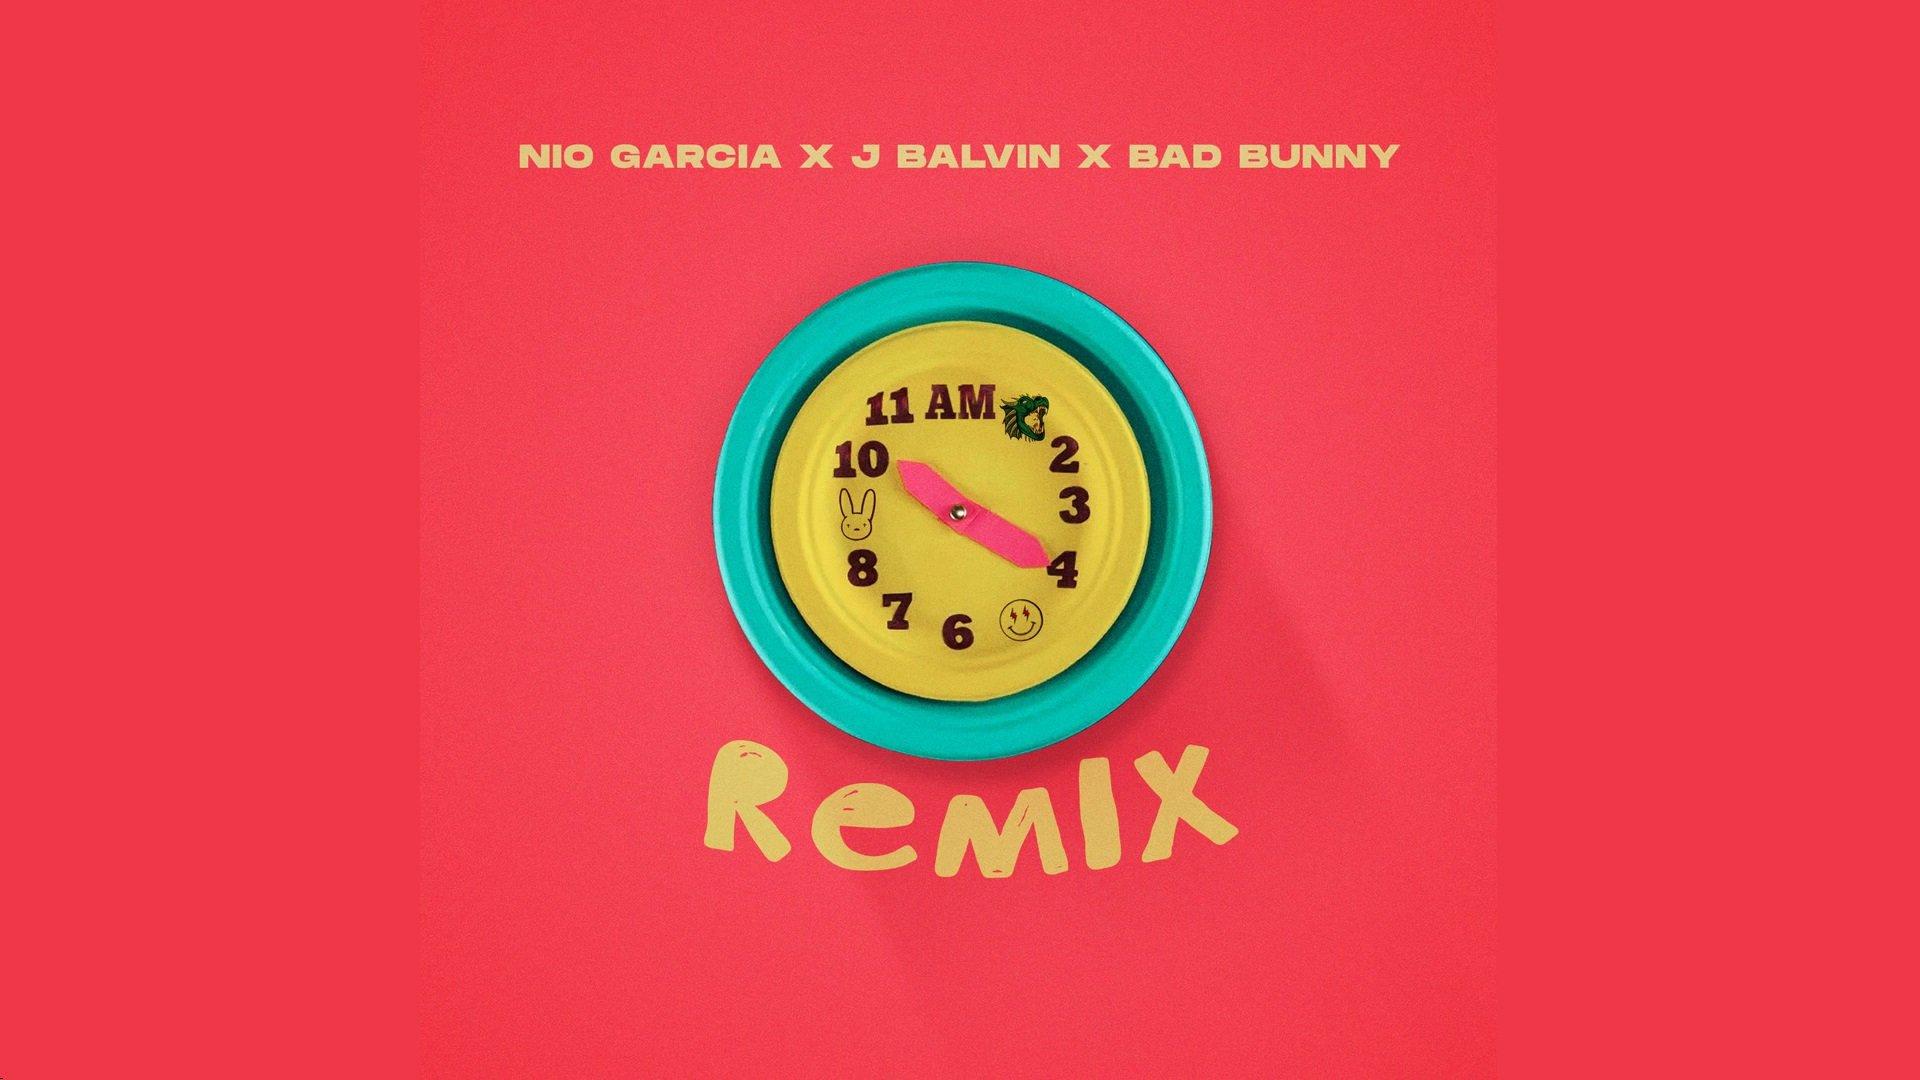 Nio Garcia x J Balvin x Bad Bunny AM